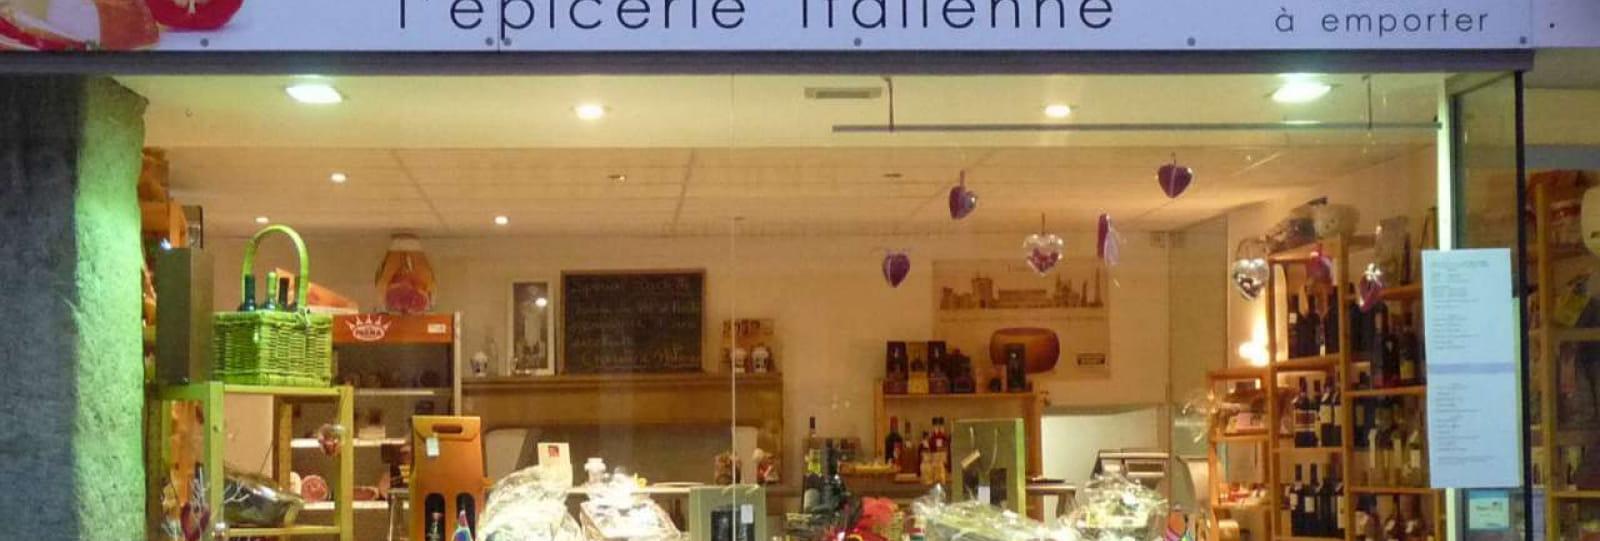 Pasta et Salsa - Epicerie italienne